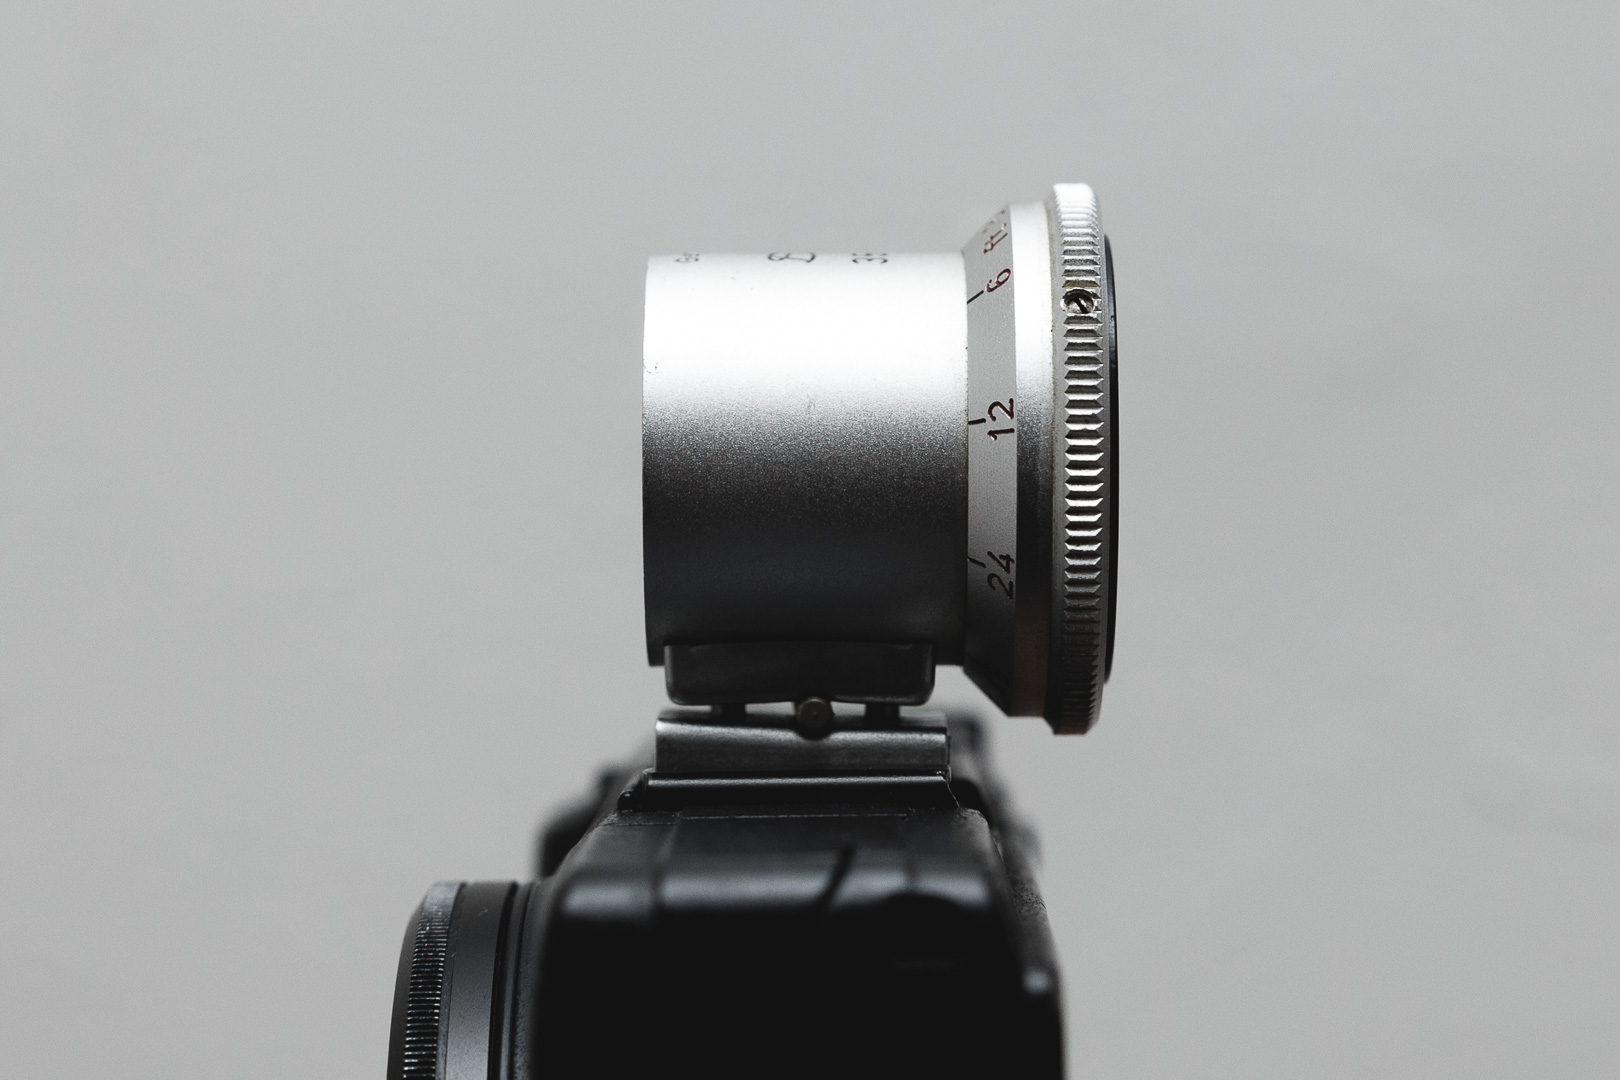 Diax-35mm-finder-Ant Tran-20170402-2974.jpg